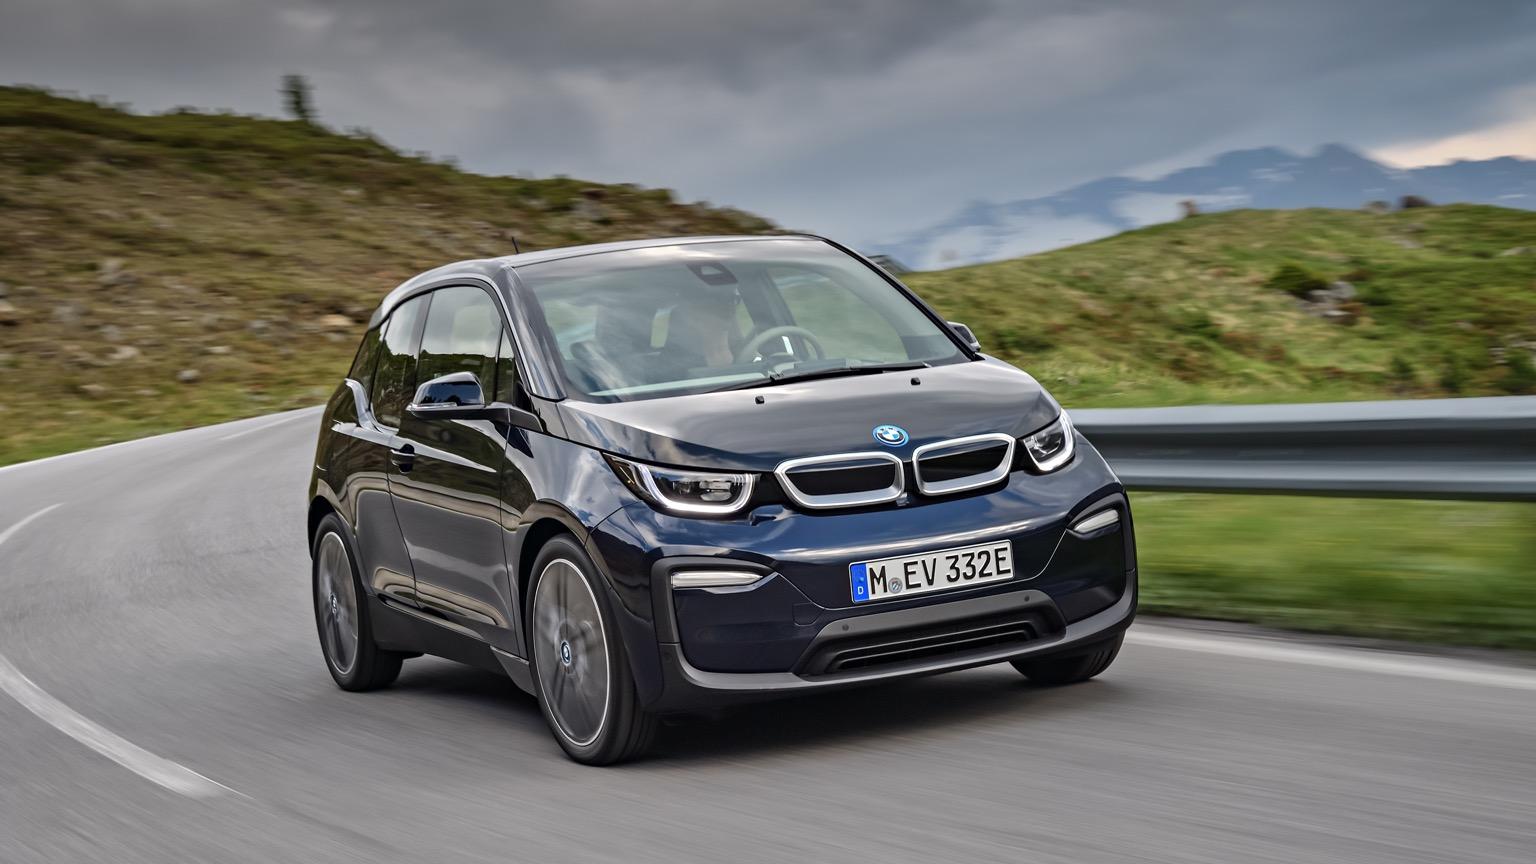 BMW i3 94 Ah (2017)